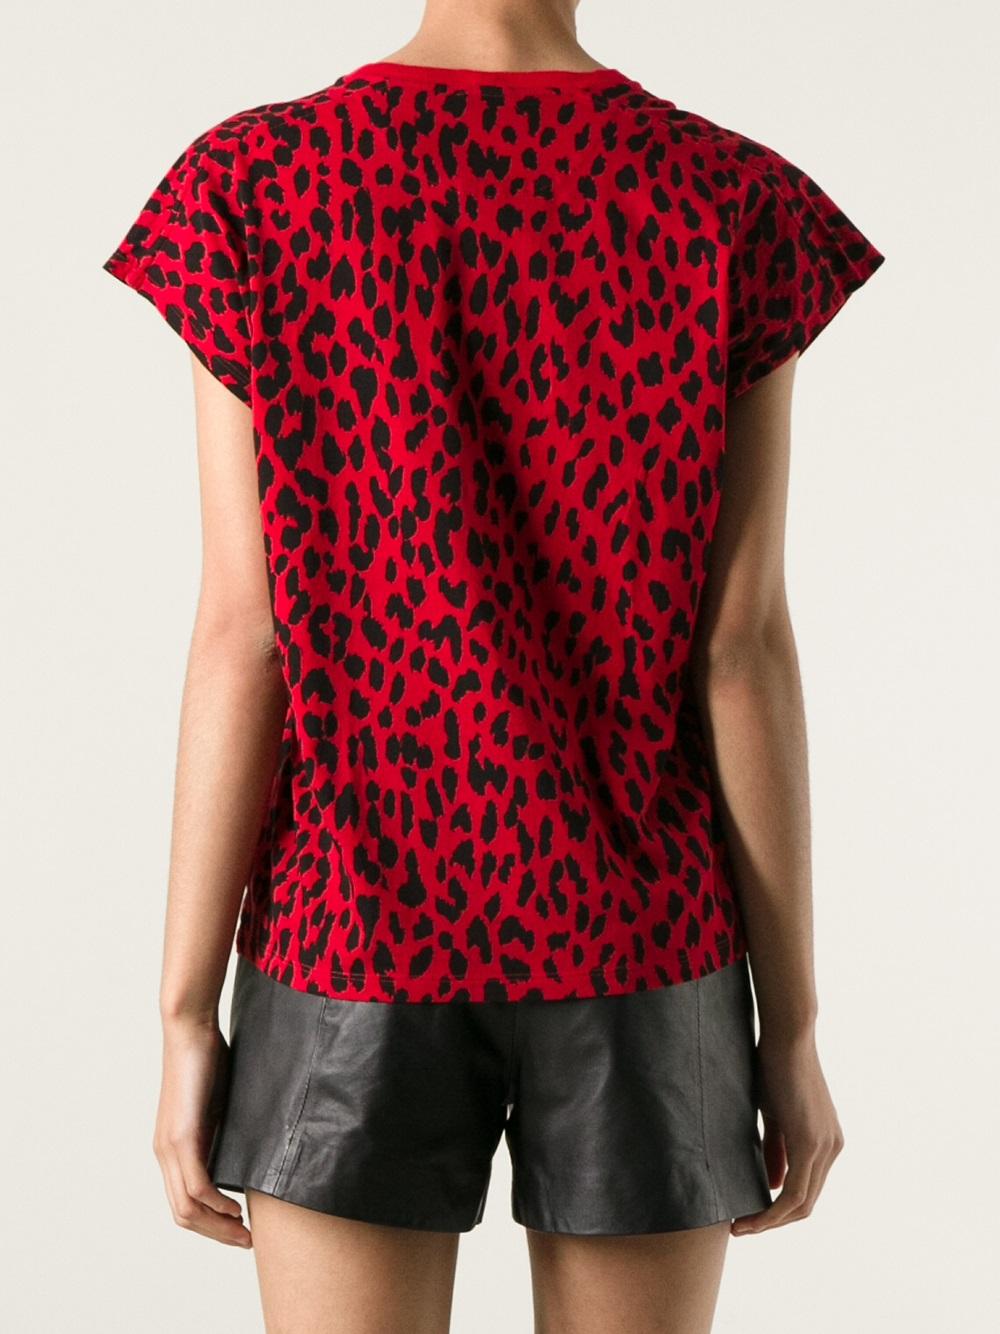 lyst saint laurent leopard print t shirt in red. Black Bedroom Furniture Sets. Home Design Ideas